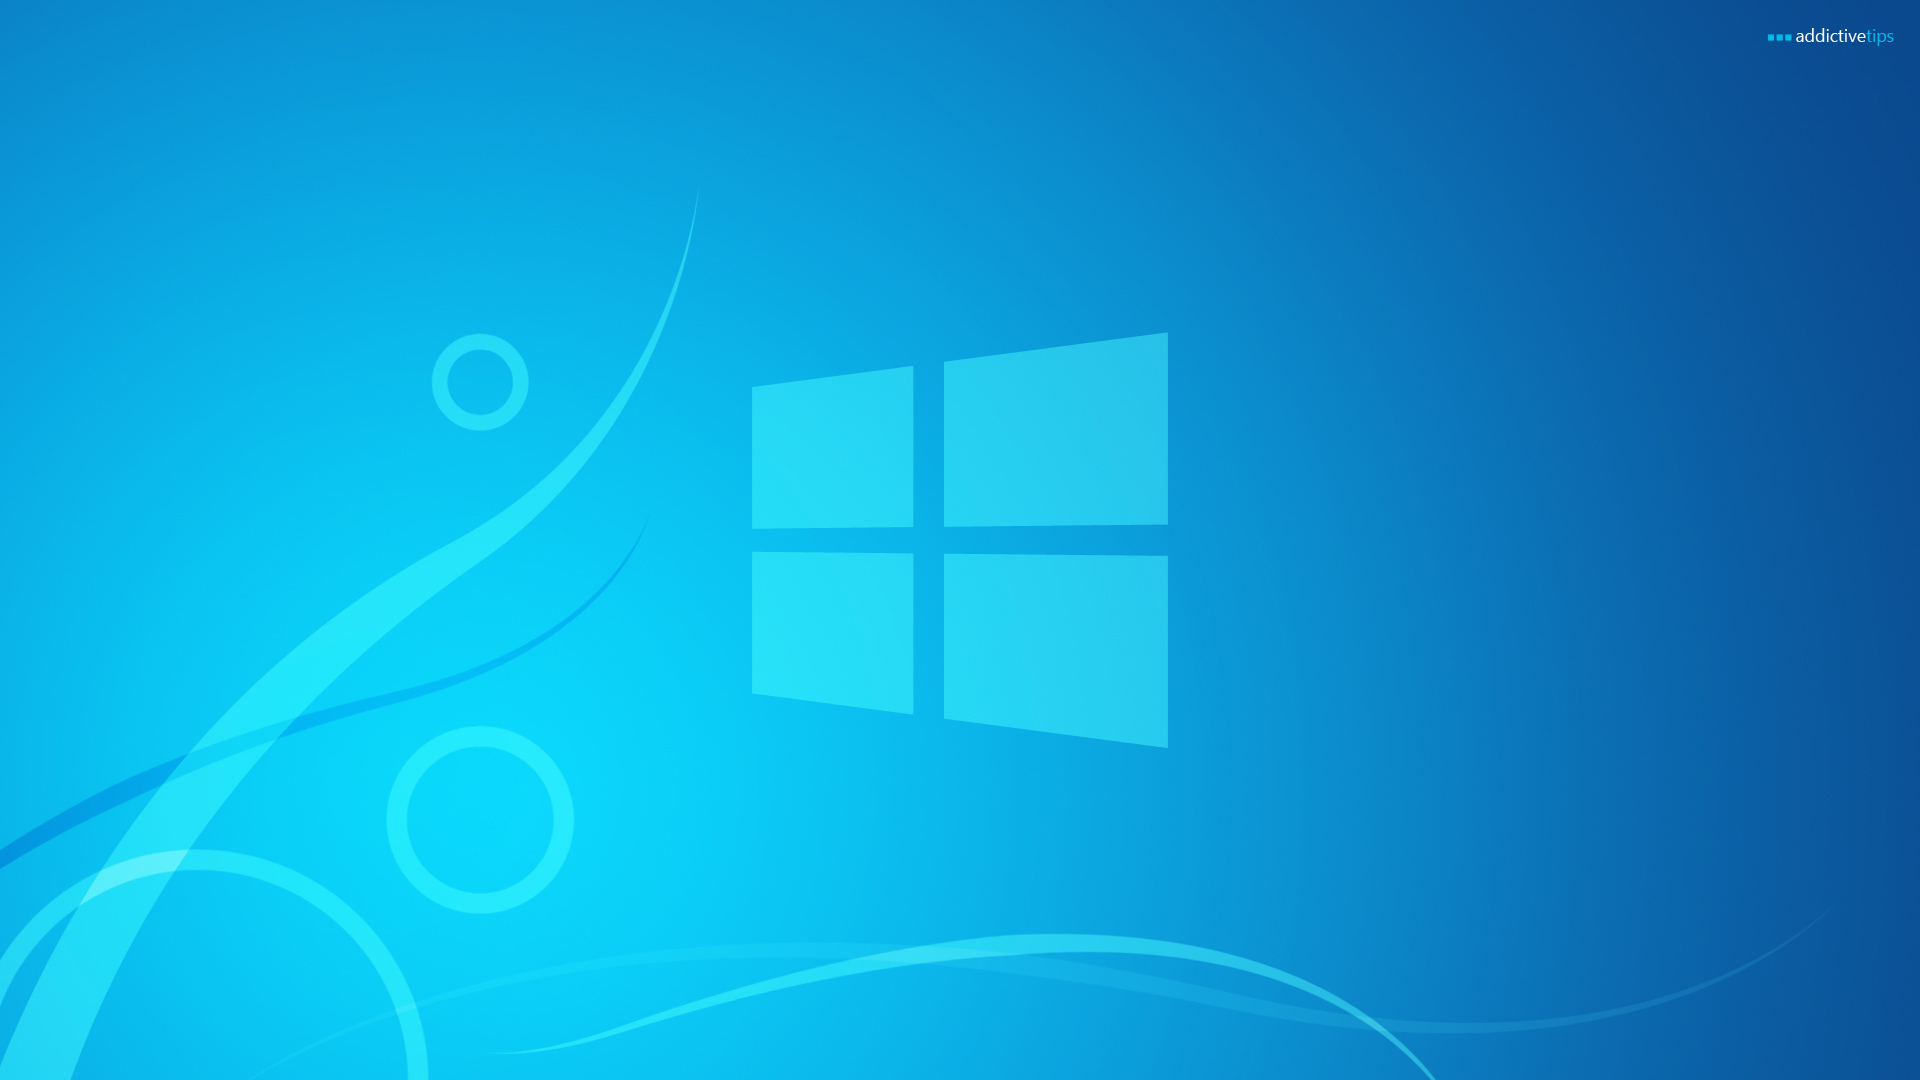 33+] Windows 8 1 Wallpaper HD 1366x768 on WallpaperSafari